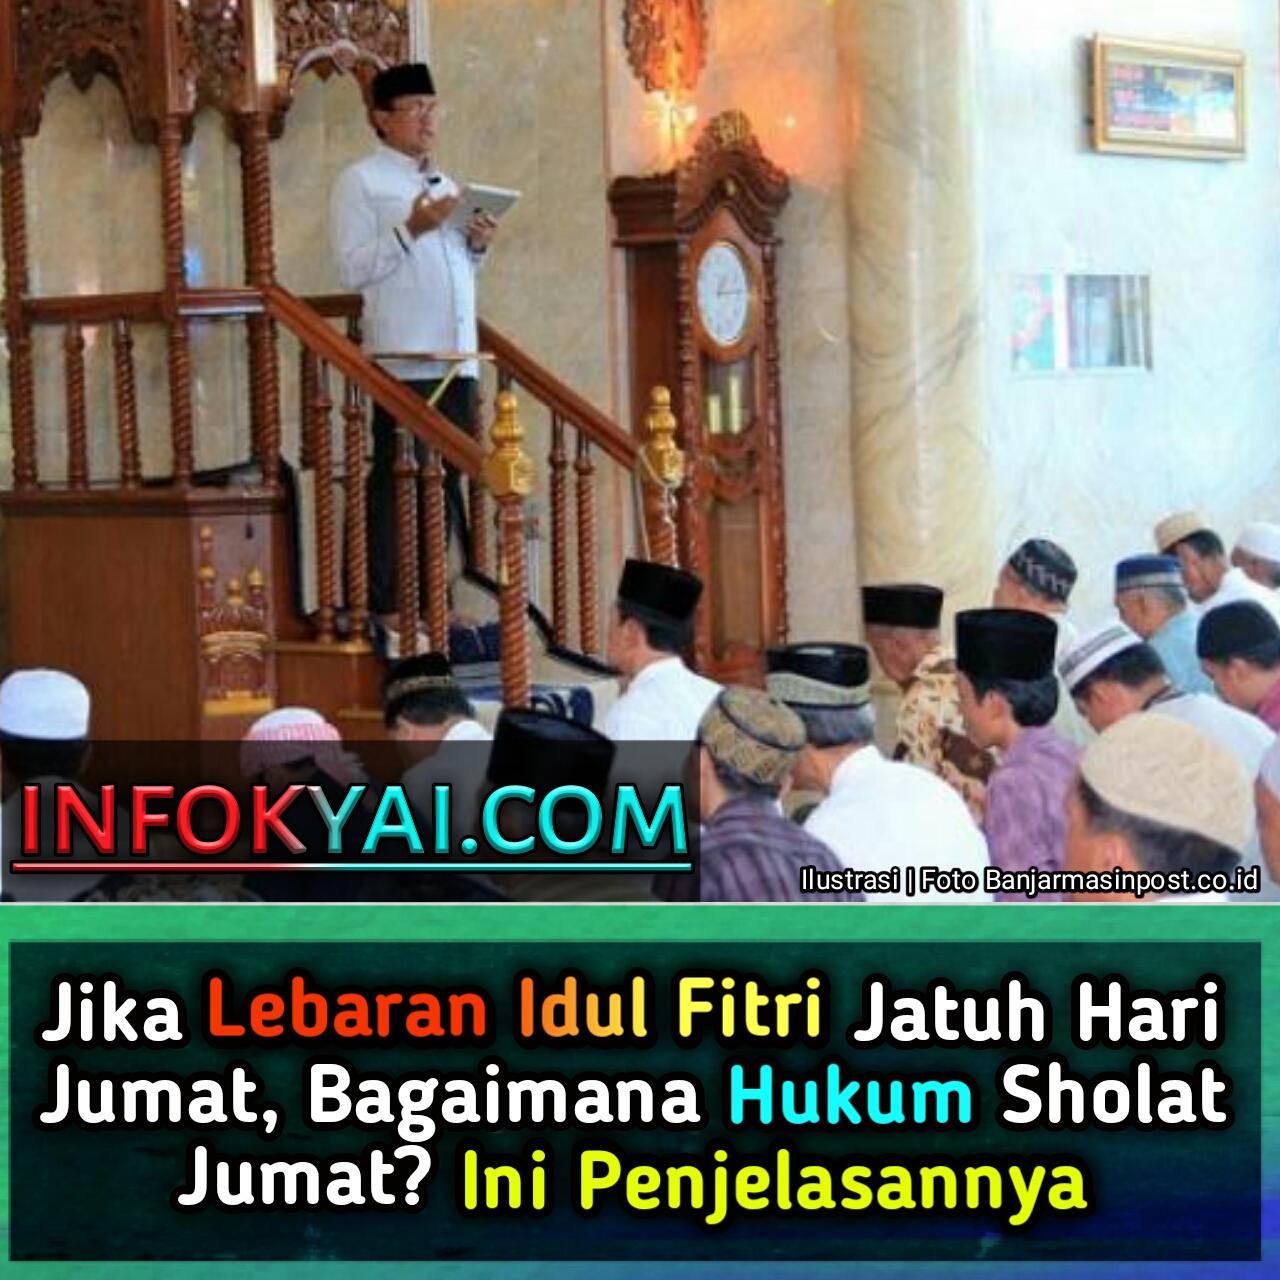 Jika Lebaran Idul Fitri Jatuh Hari Jum'at, Bagaimana Hukum